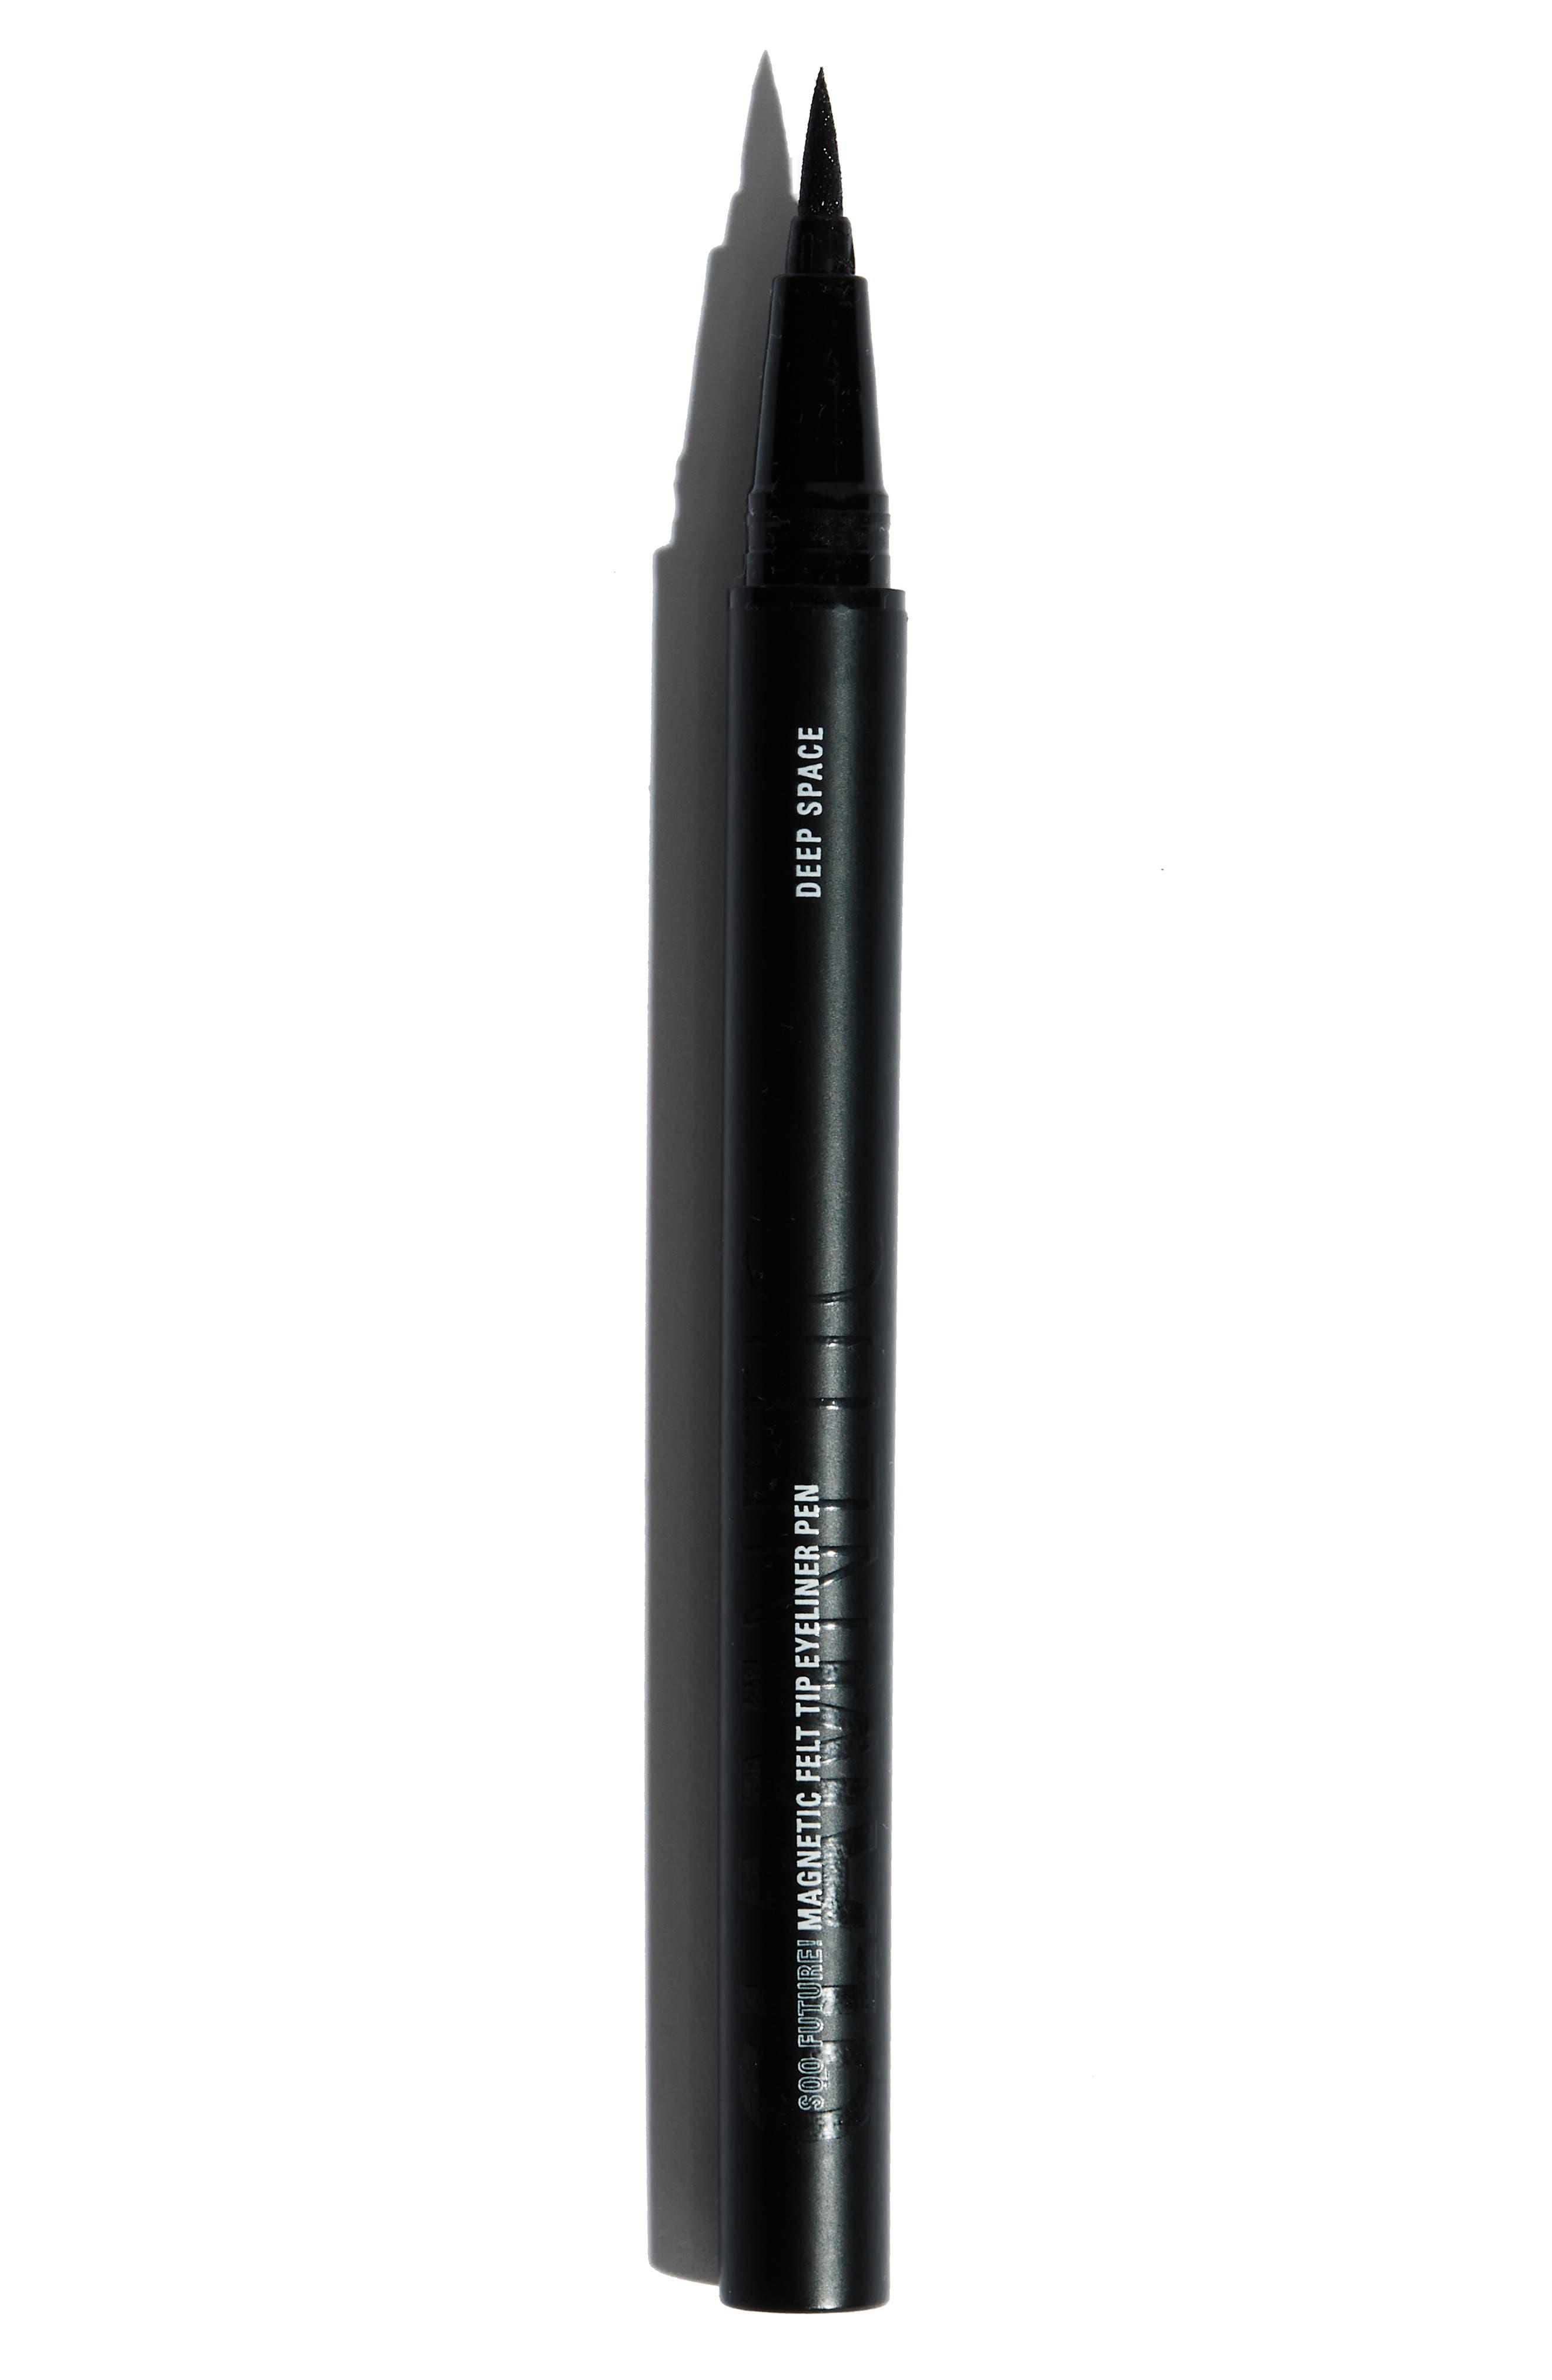 Soo Future! Magnetic Felt Tip Eyeliner Pen